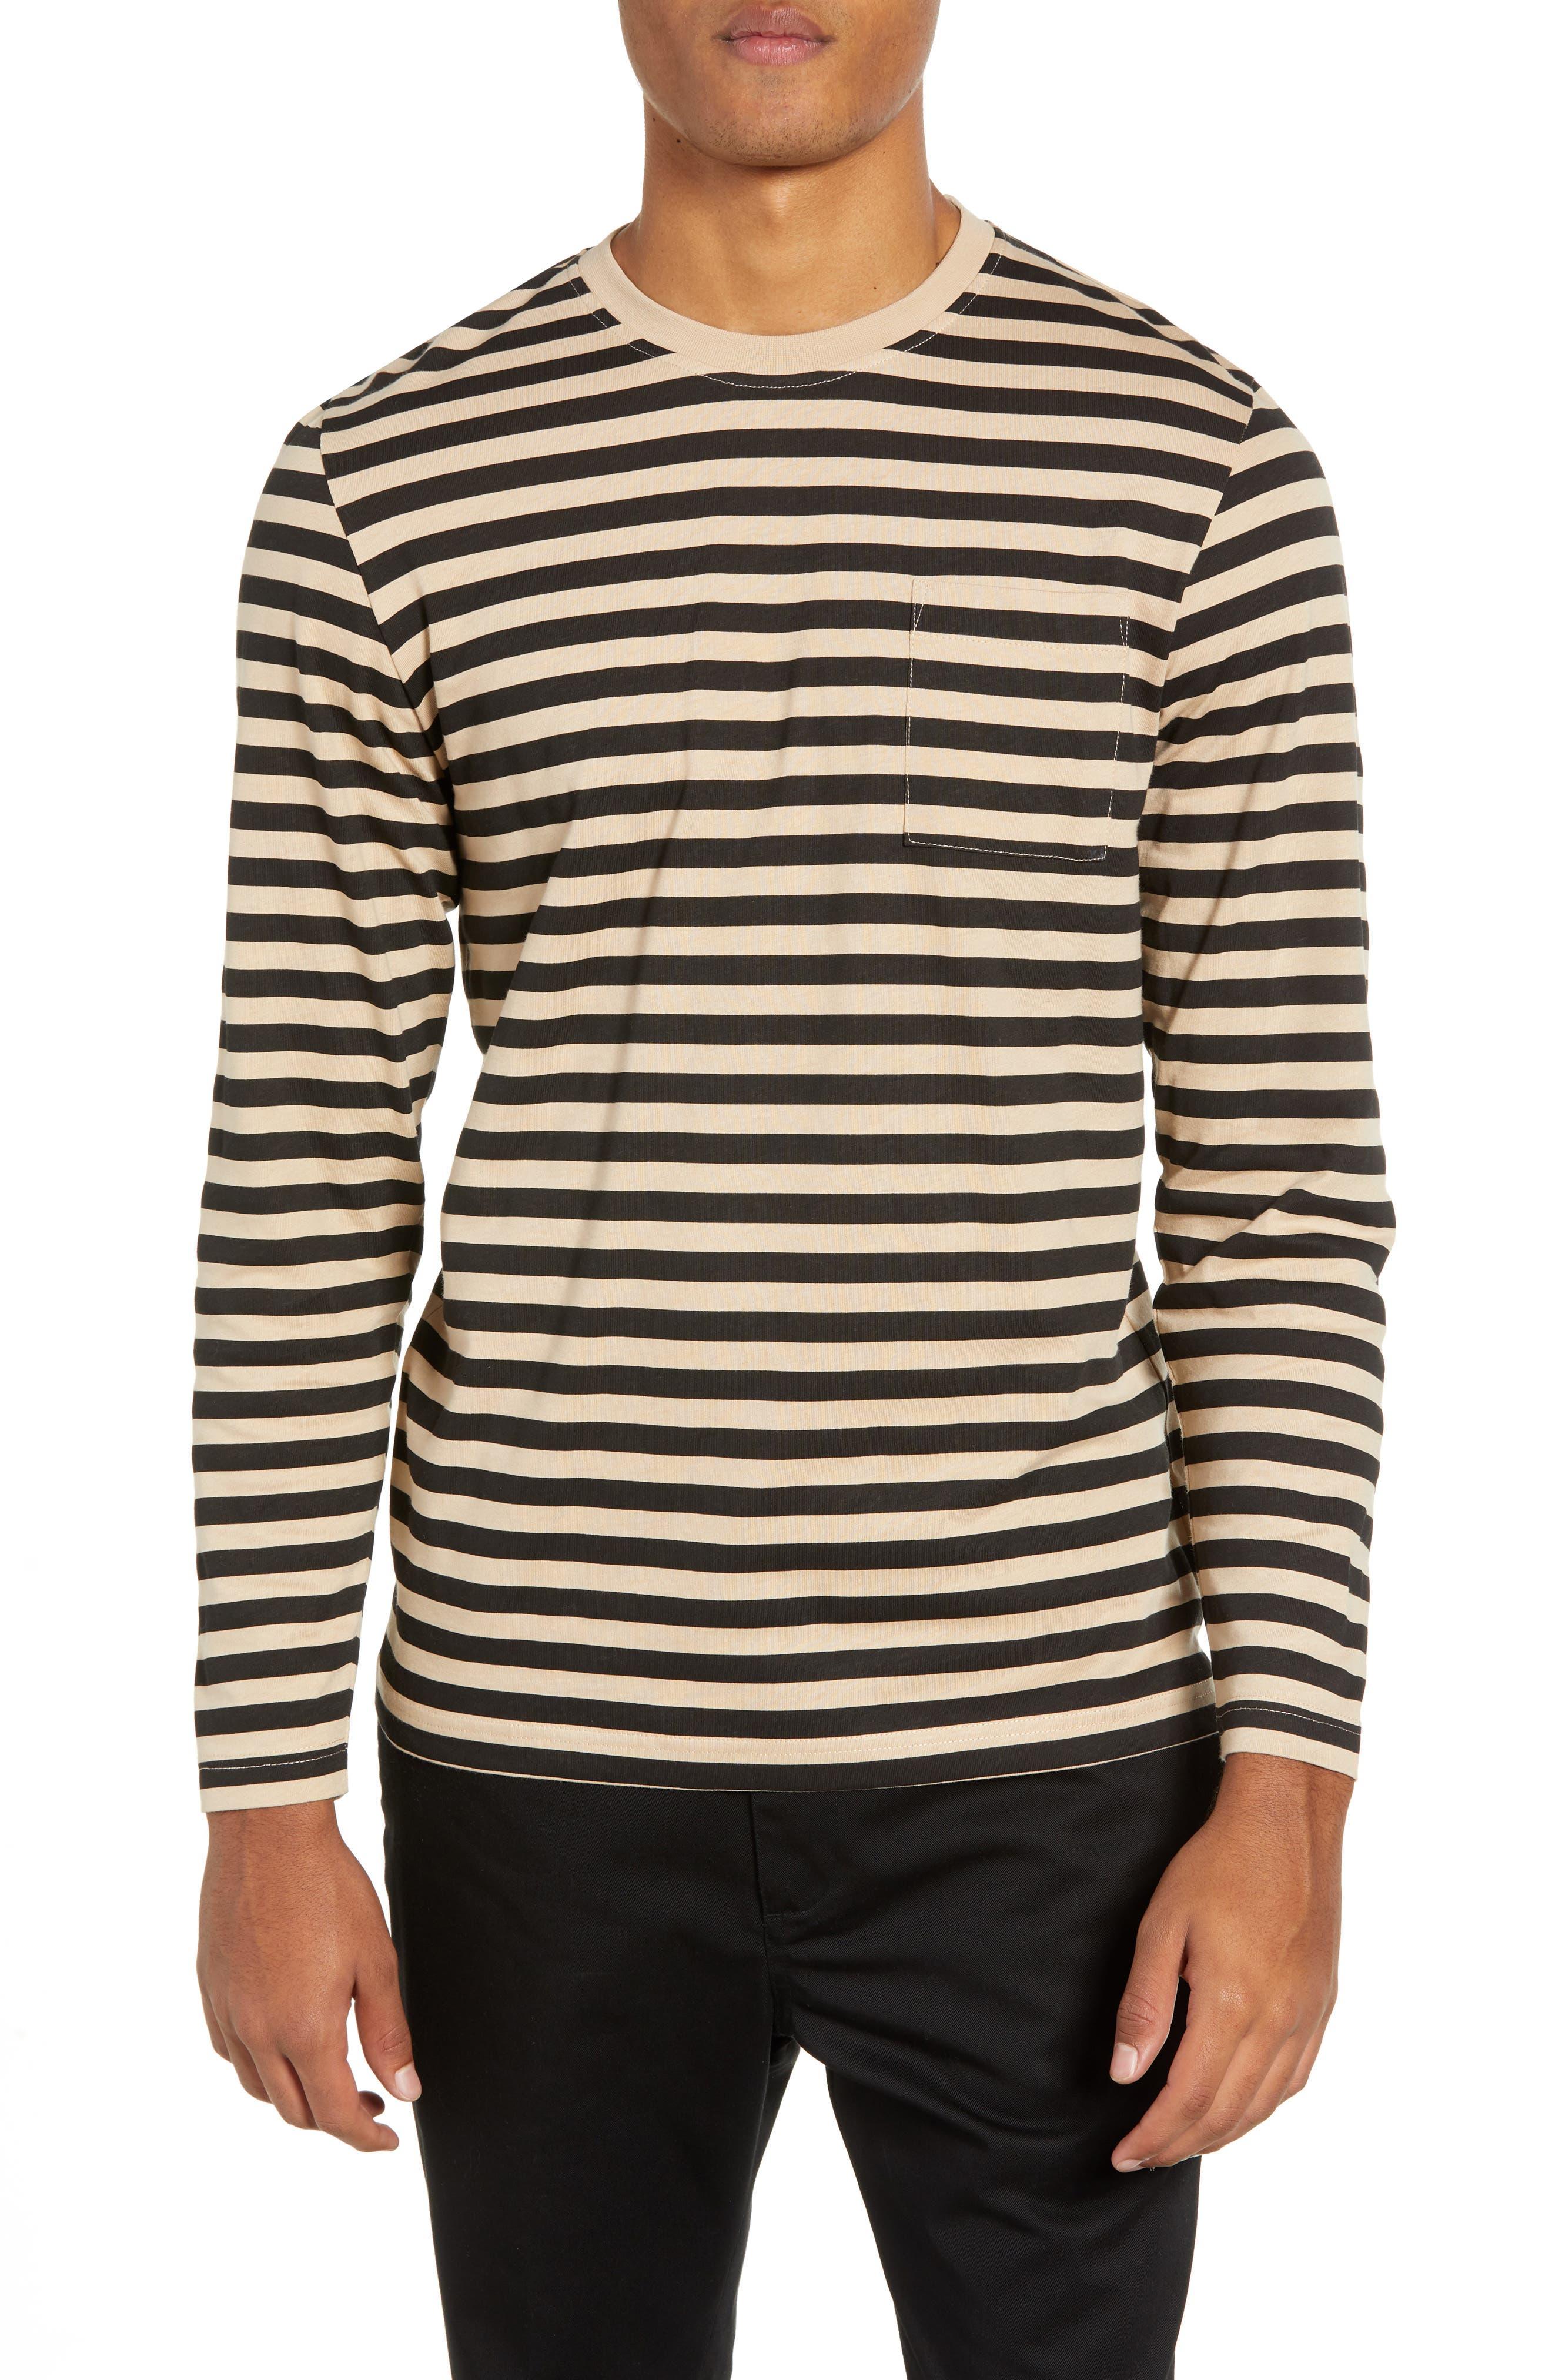 Wesc Makai Stripe Long Sleeve Pocket T-Shirt, Beige